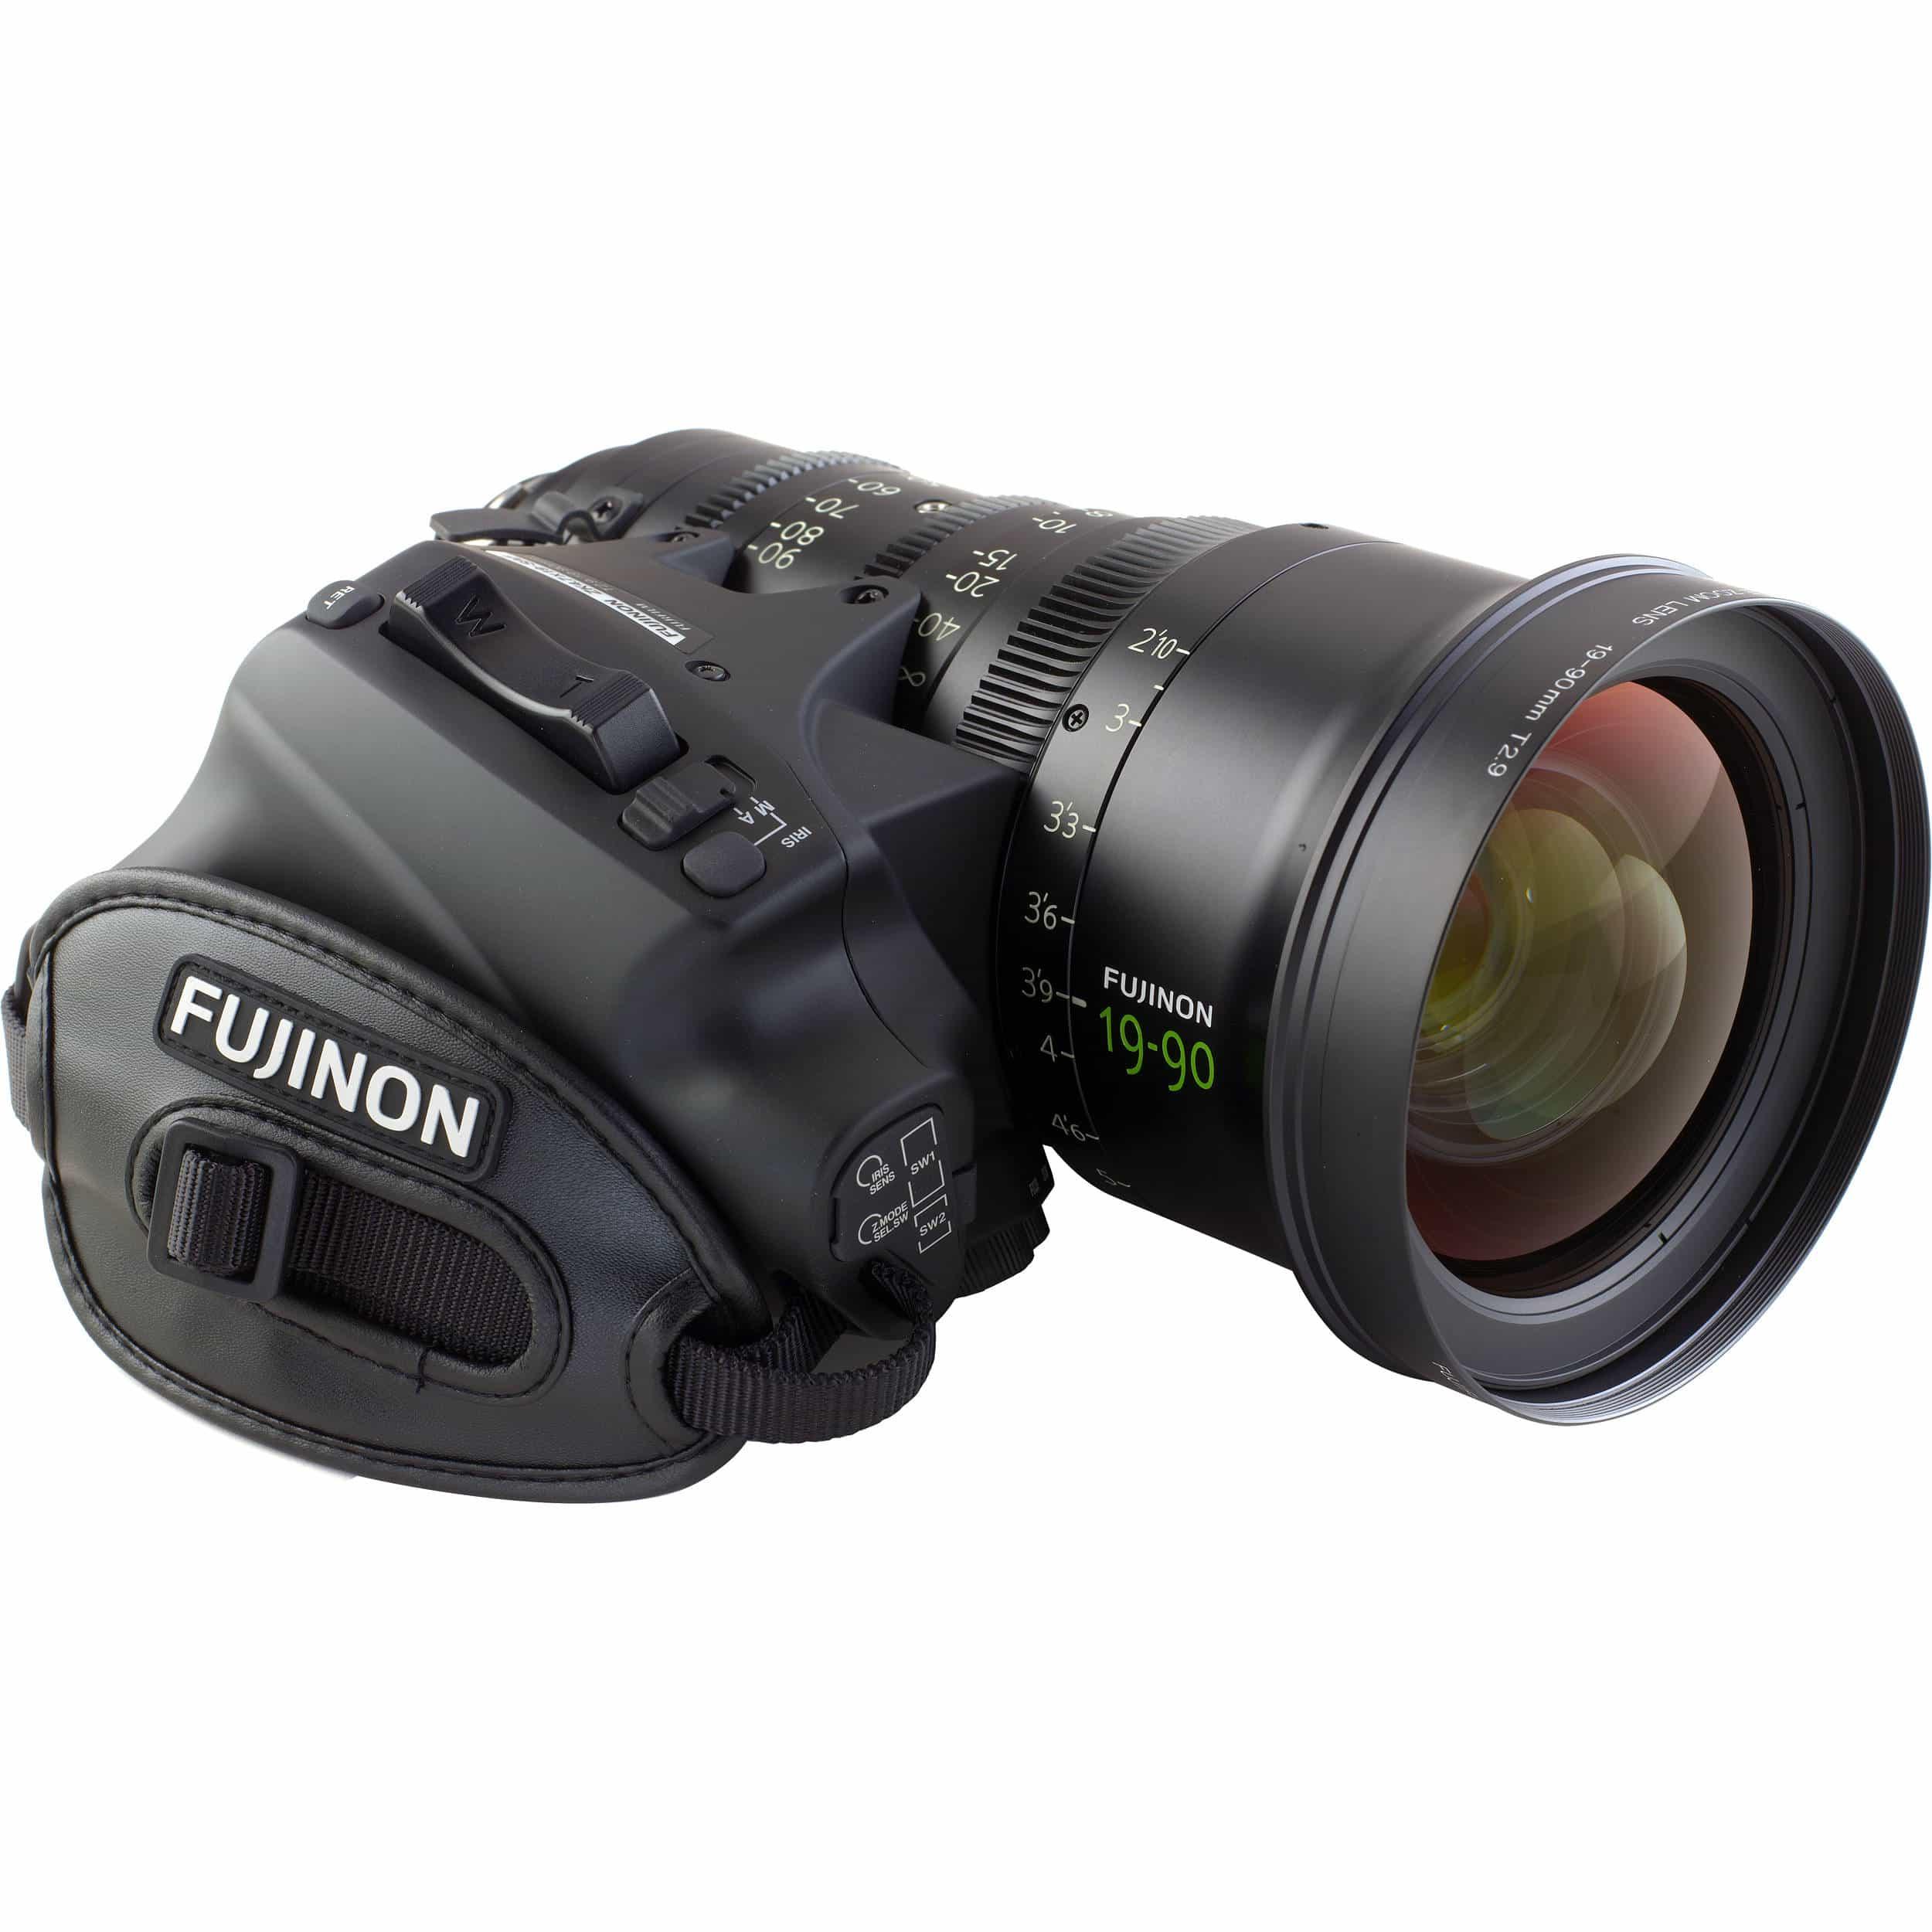 Harga Dan Spek Ultimate Black Friday 2018 Camera Deals Lenses Mango Ma6688l 80 White Silver Fuji Lens Terminology And Abbreviations Explained Accessory Round Up